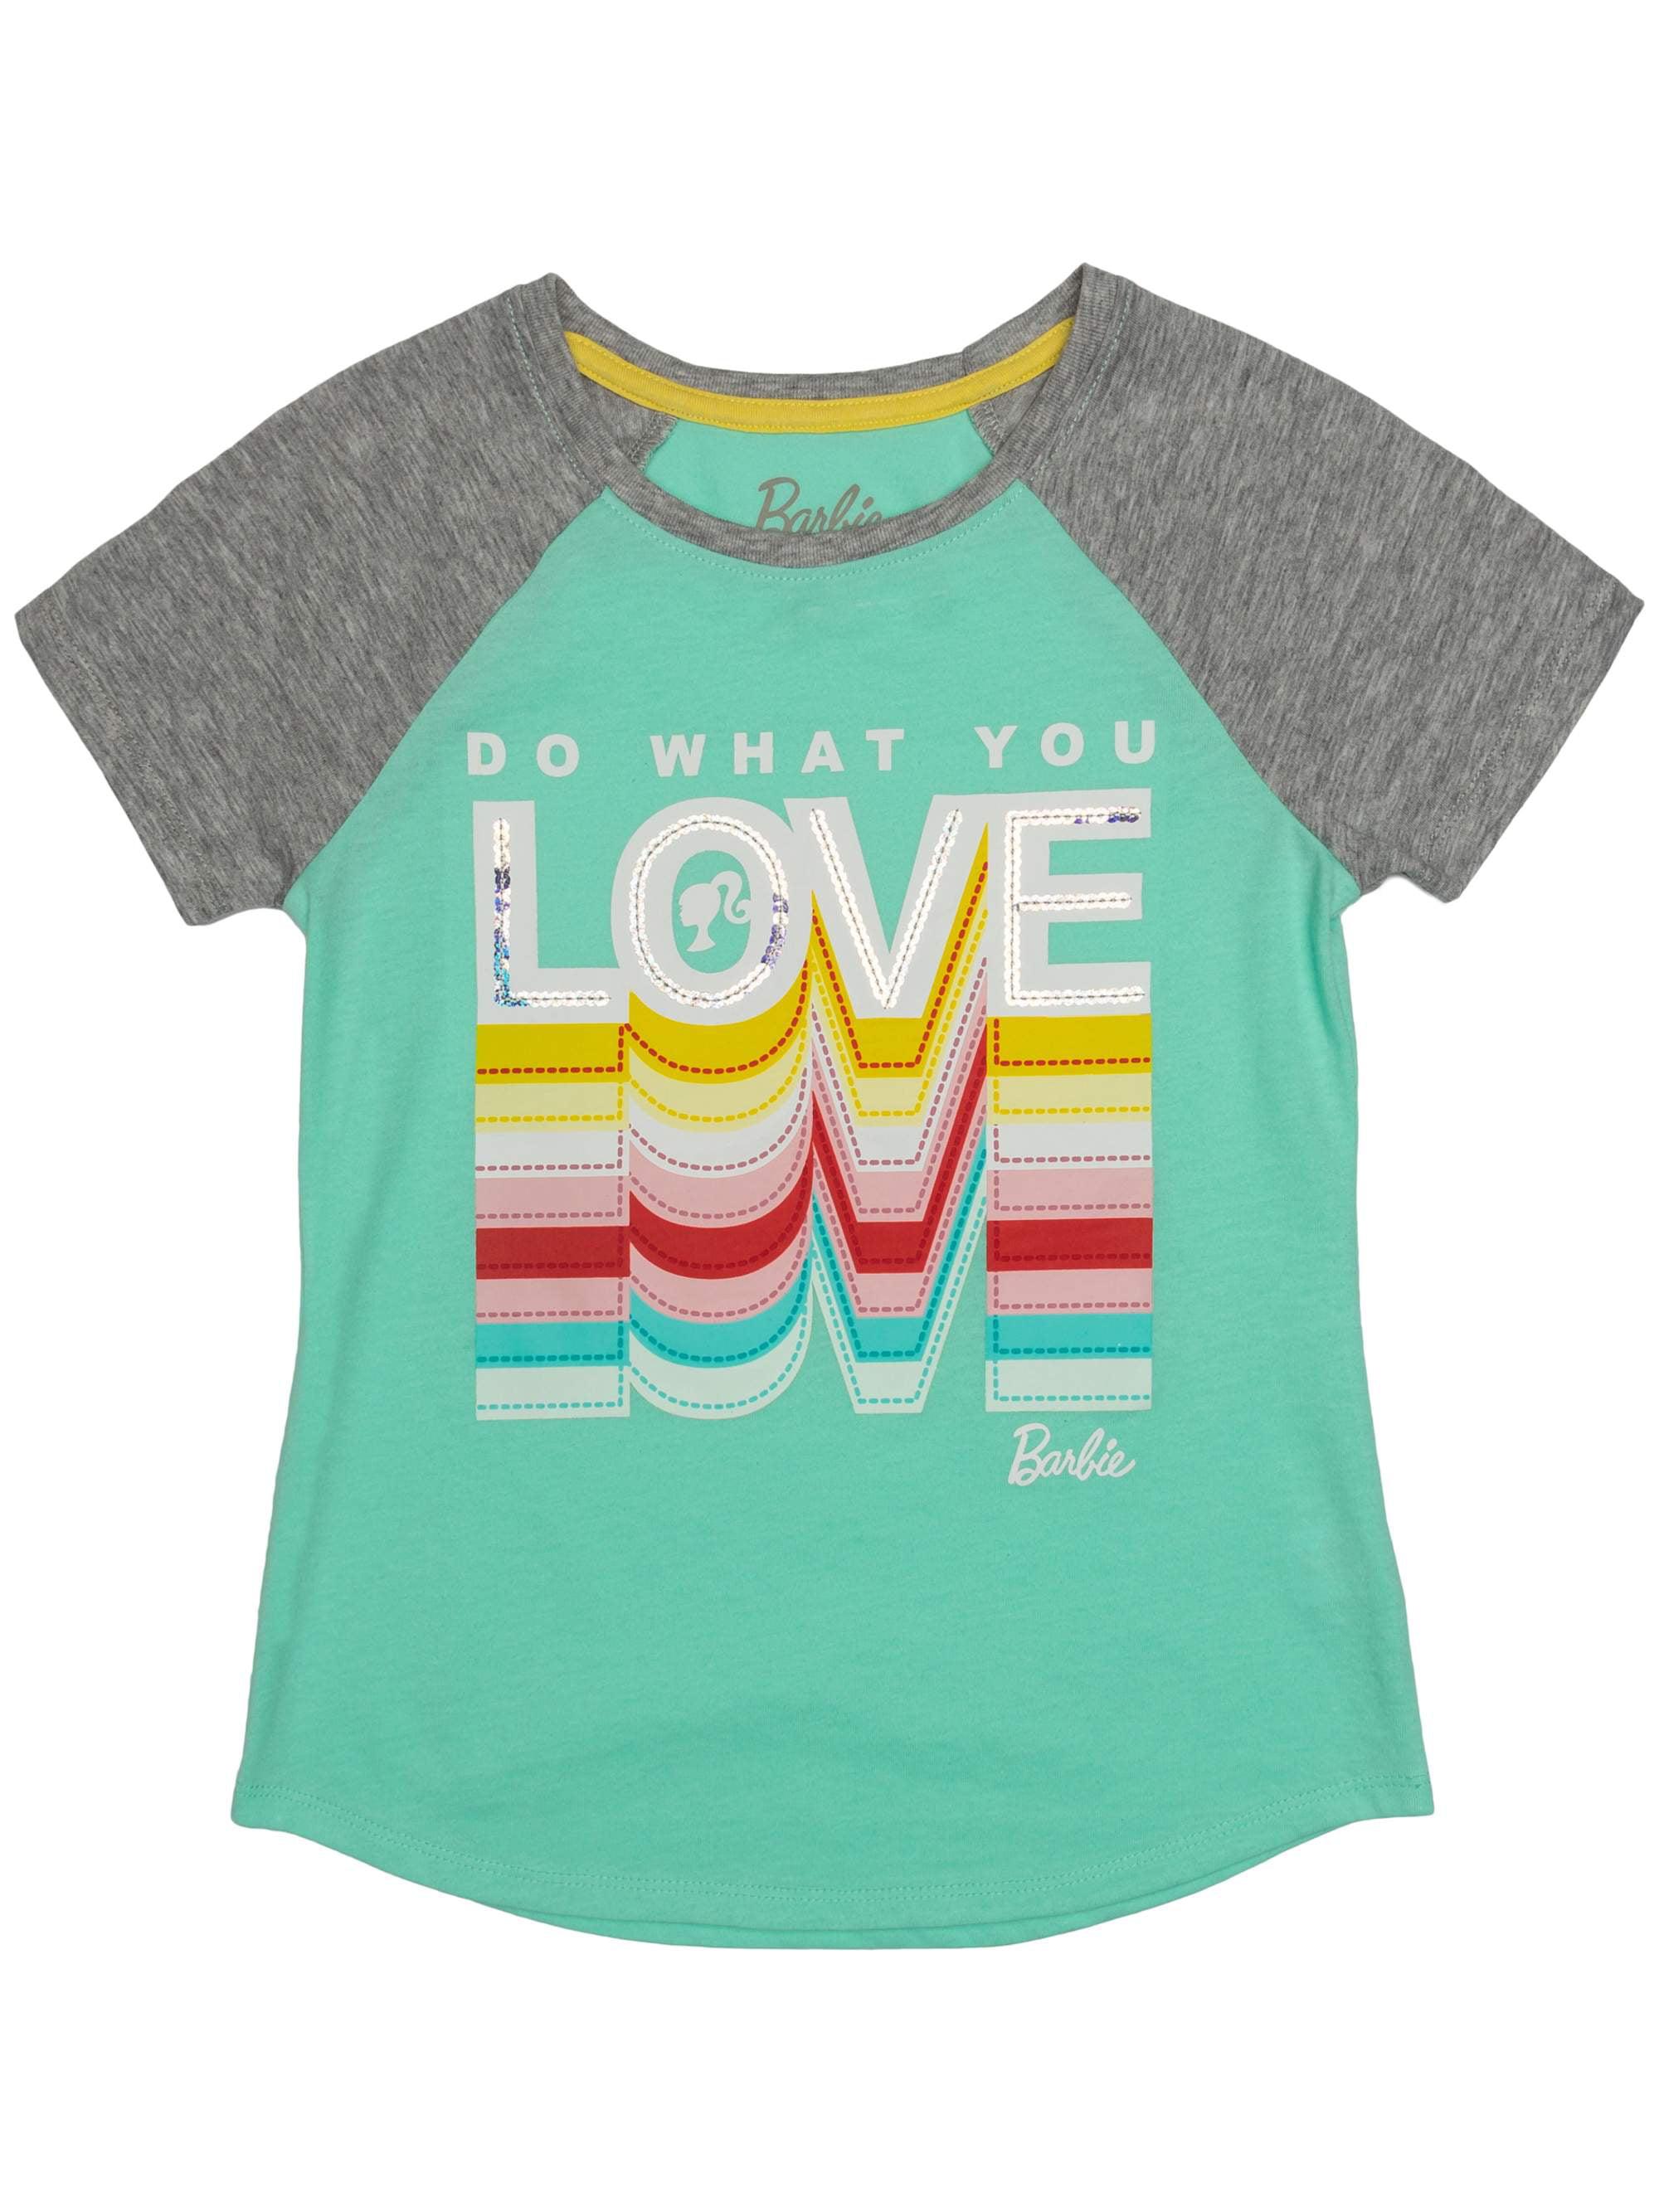 Love Embroidered Sequin Raglan Graphic Tee (Little Girls & Big Girls)